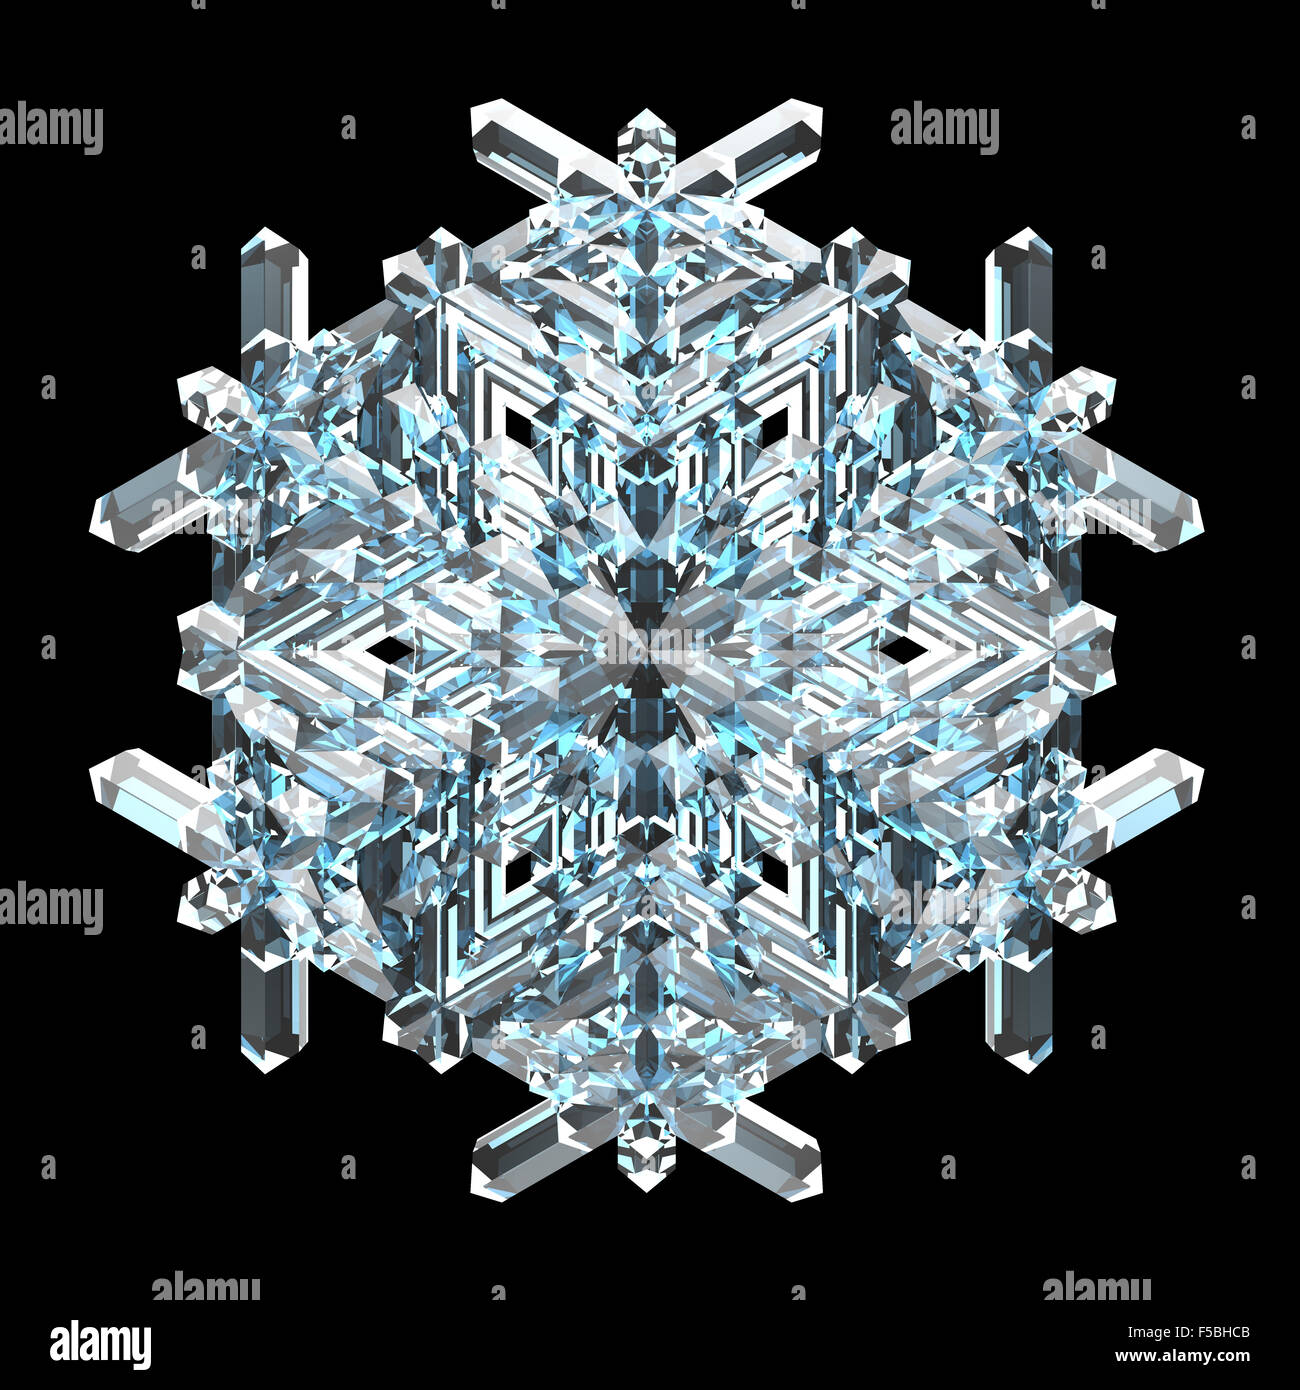 Single blue crystal snowflake on a black background - Stock Image